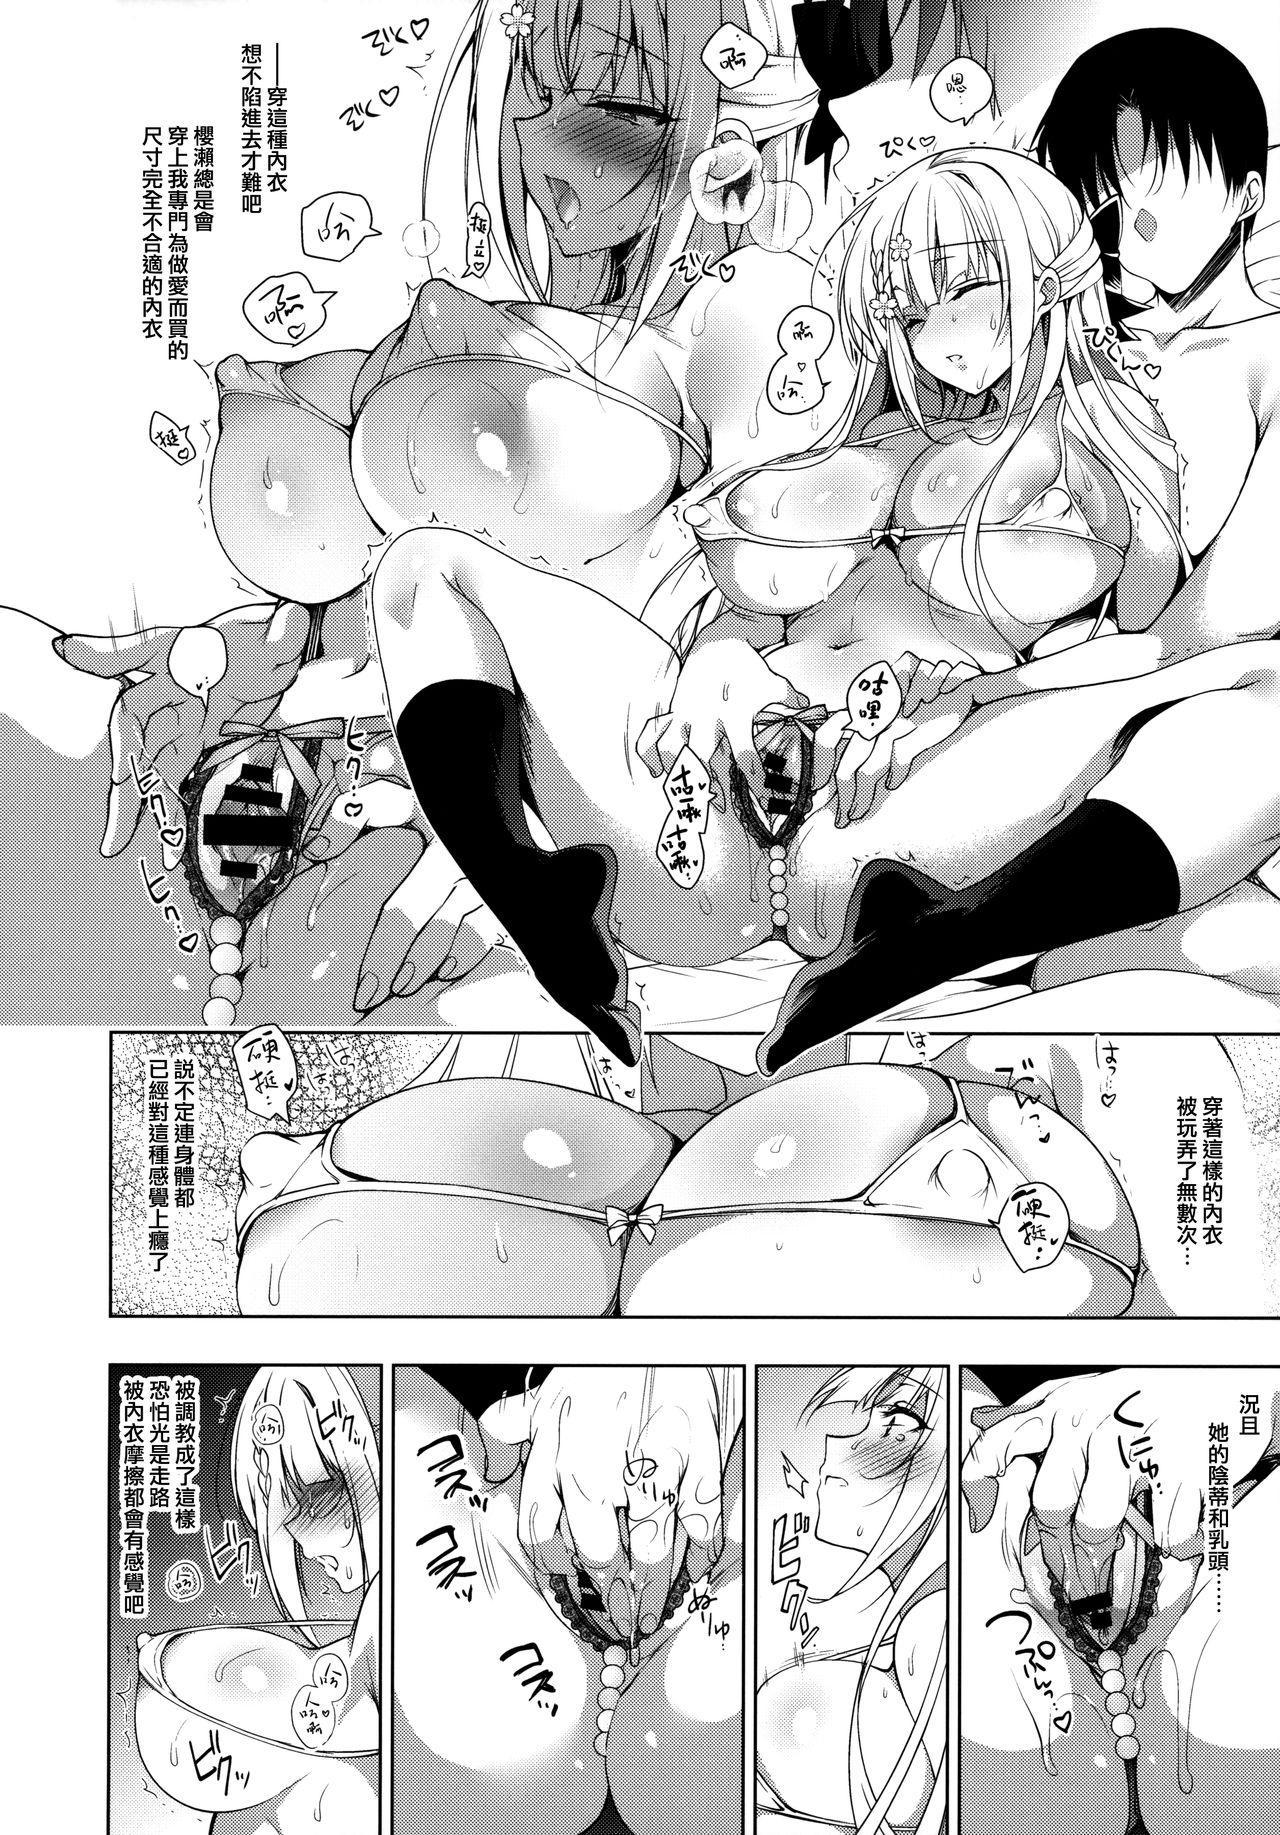 Shoujo Kaishun 7 + Ninokoya C97 Melonbooks Omakebon 17